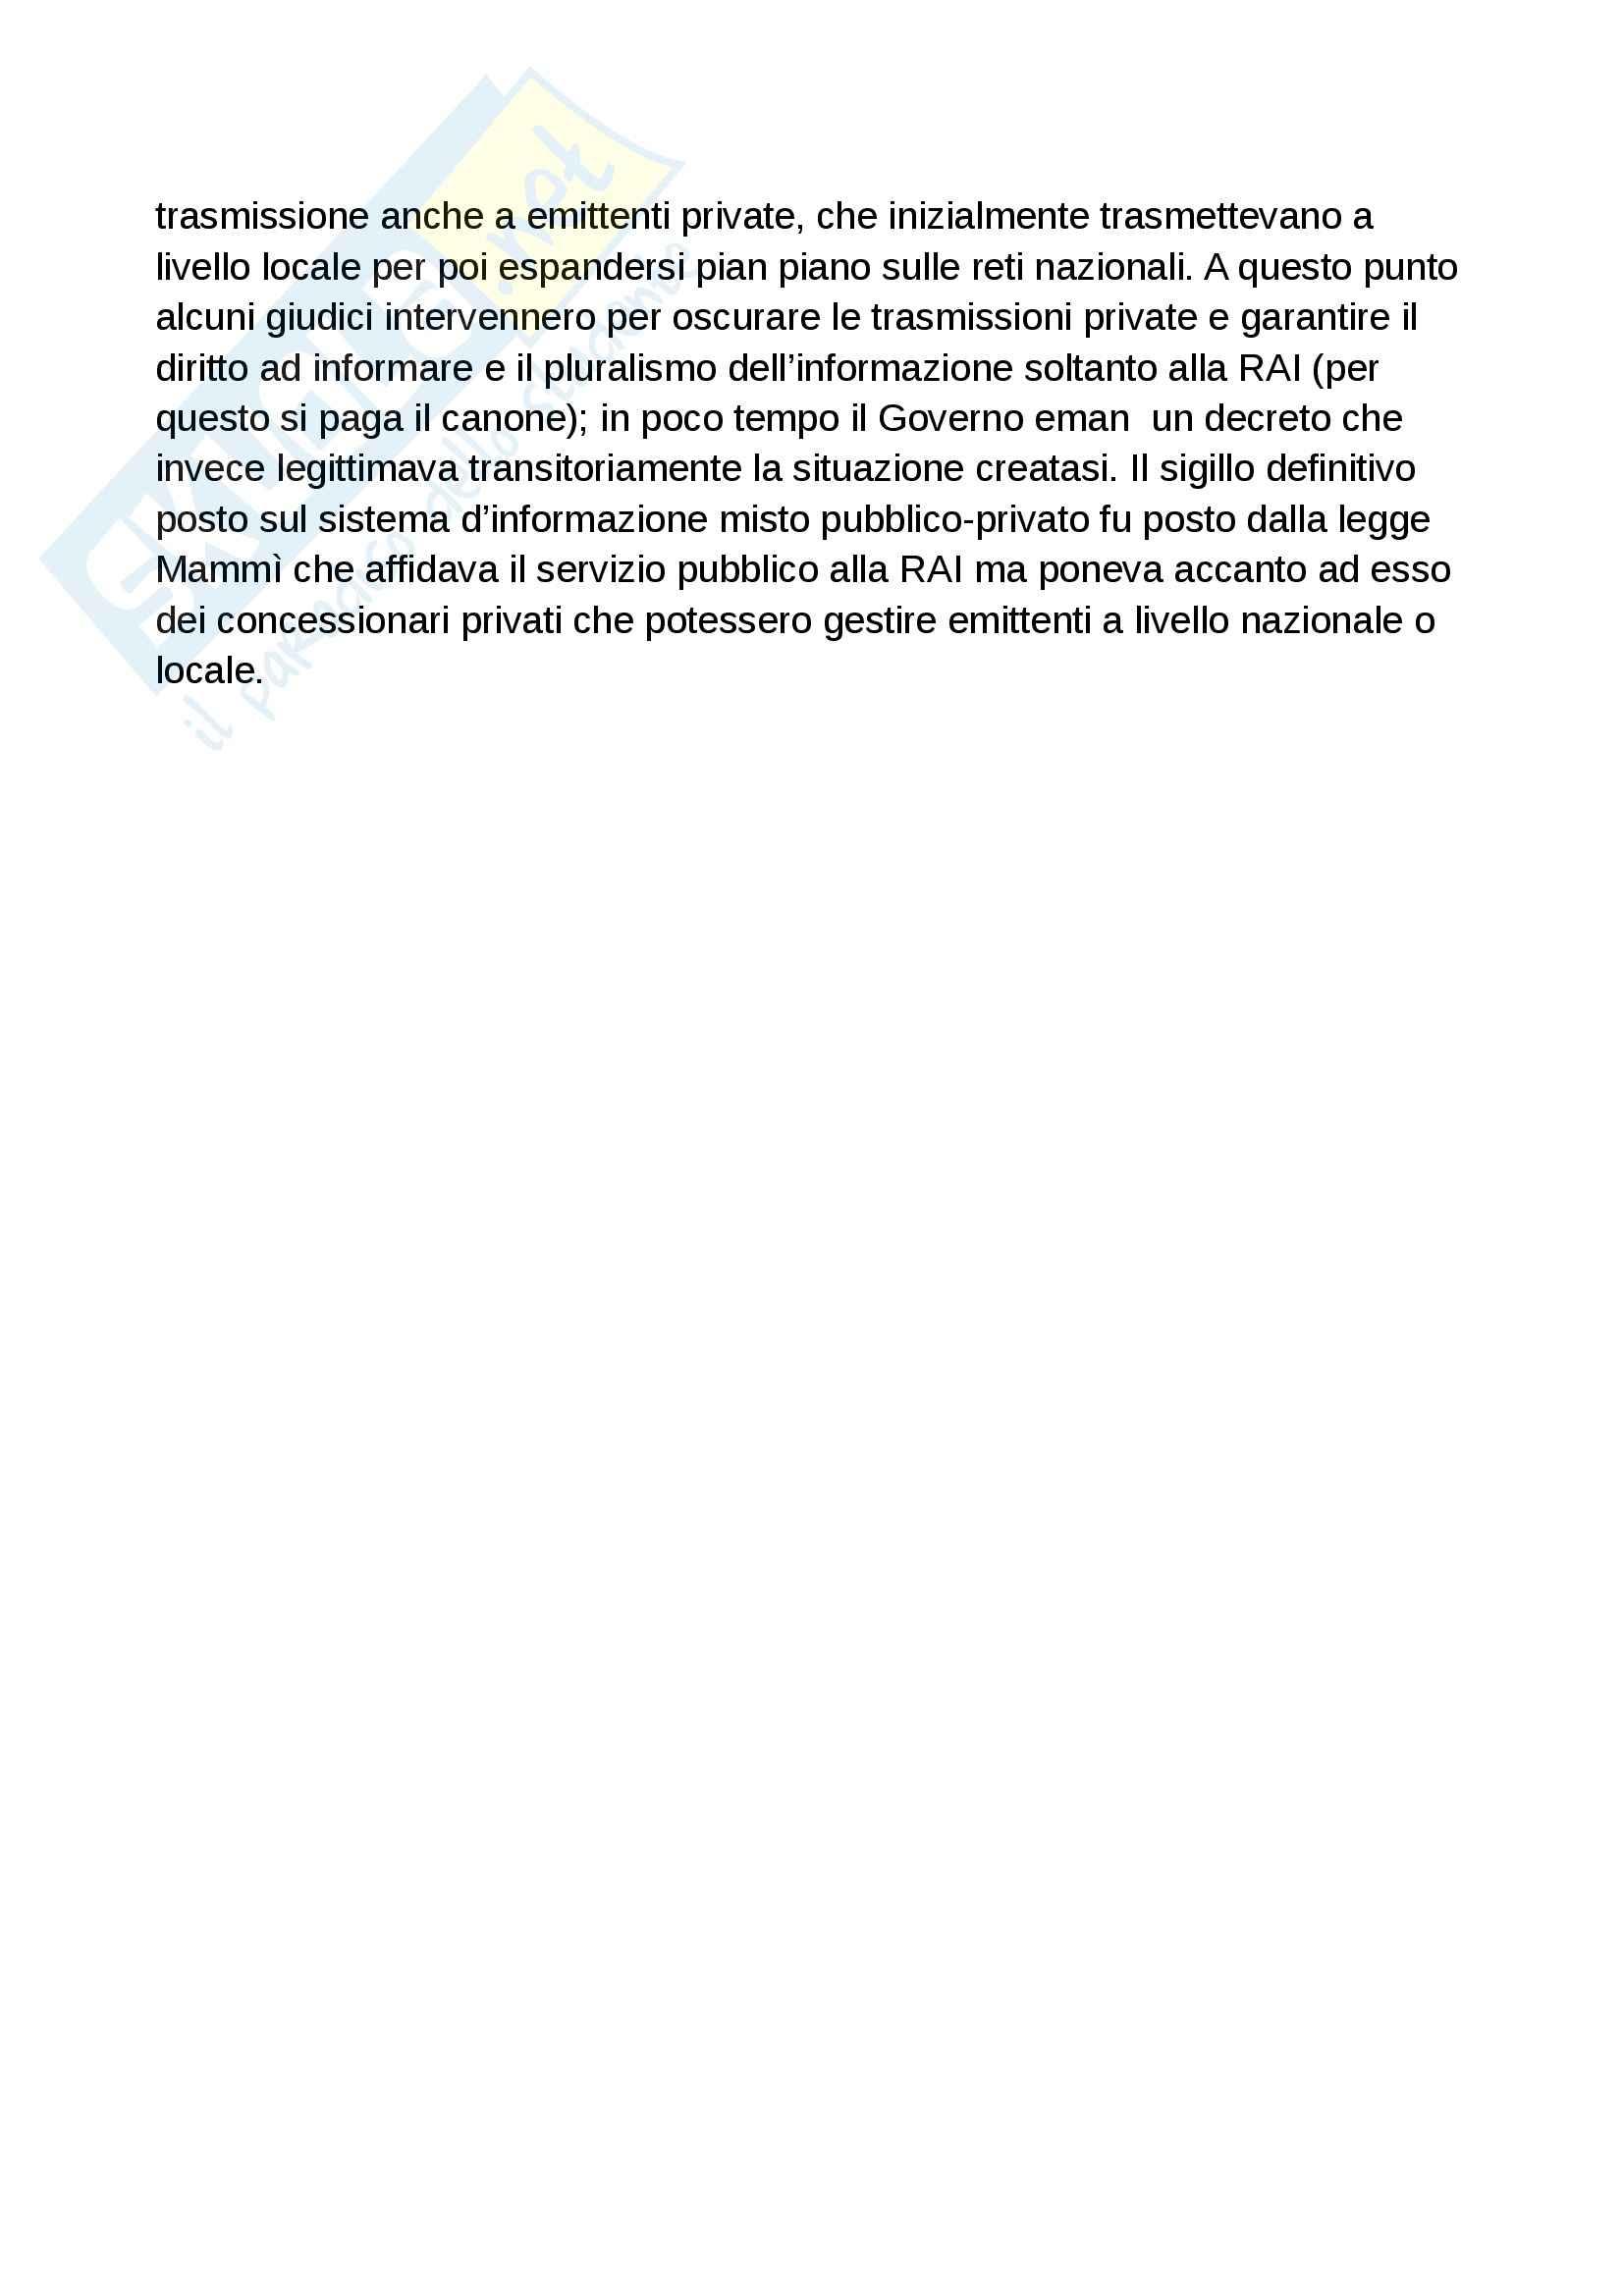 Riassunto esame diritto costituzionale, prof. Grosso, libro Diritto costituzionale, Bin, Pitruzzella Pag. 91